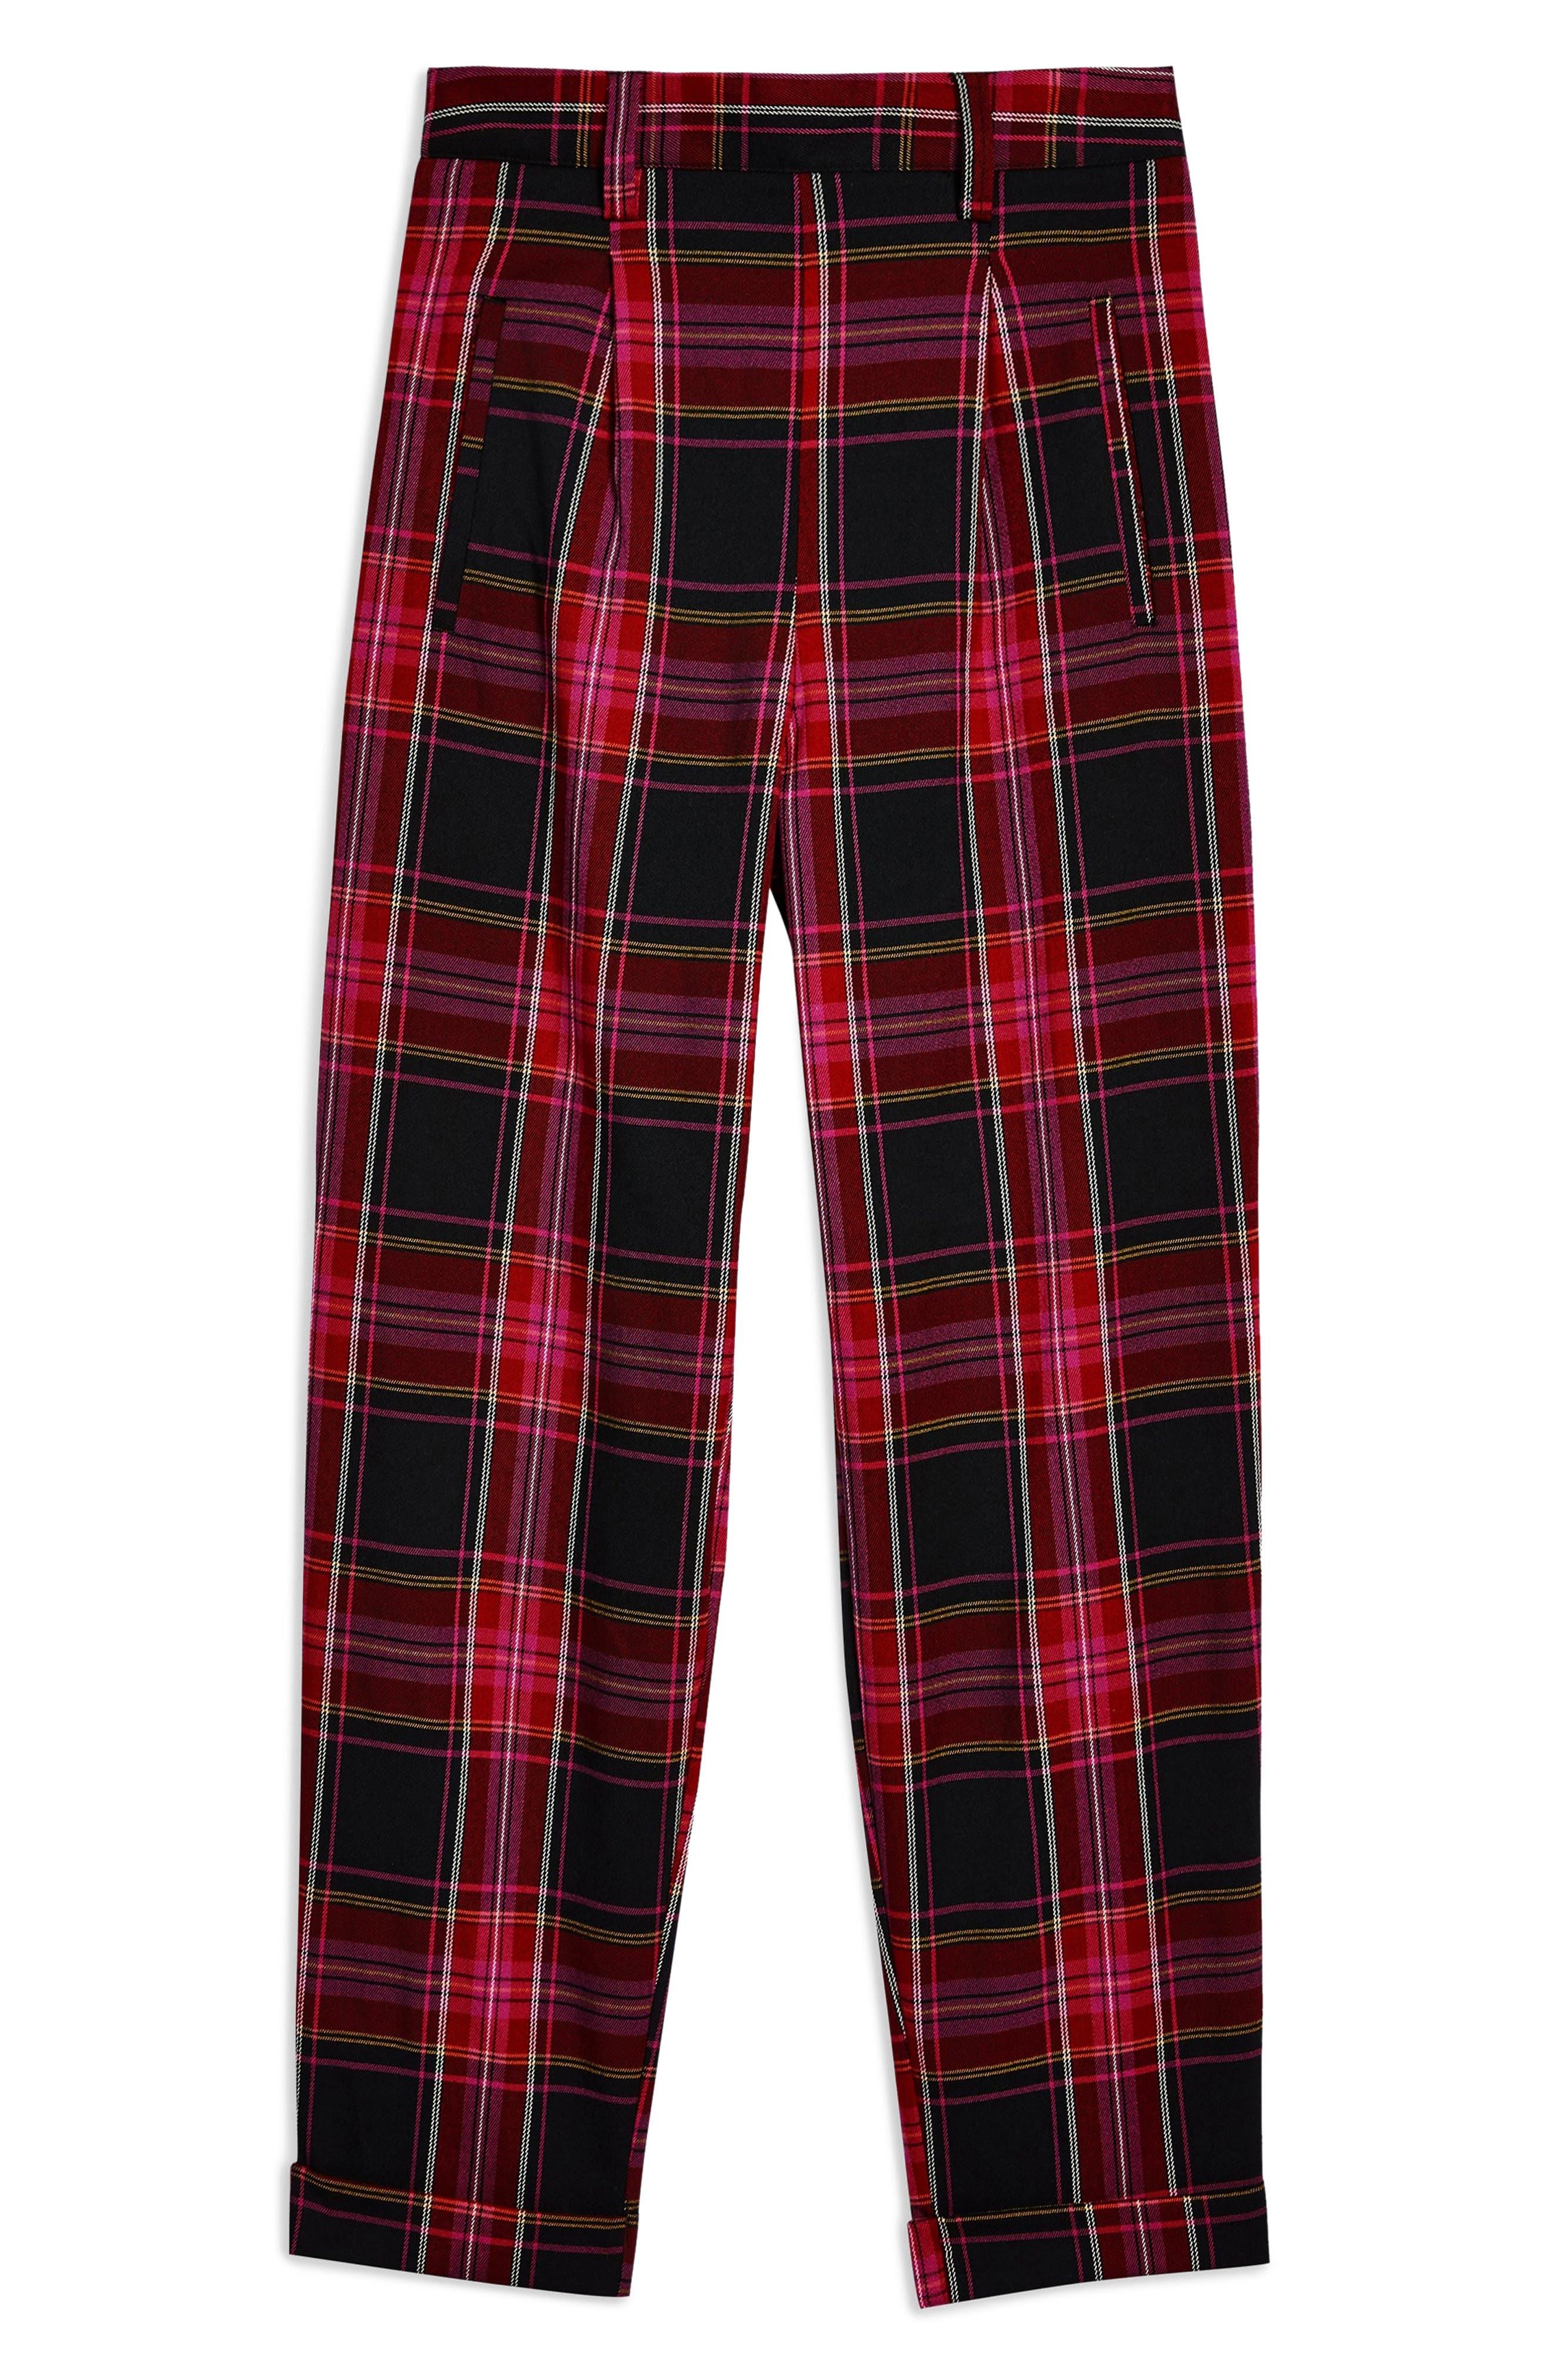 Martha Check Peg Leg Trousers,                             Alternate thumbnail 3, color,                             PINK MULTI